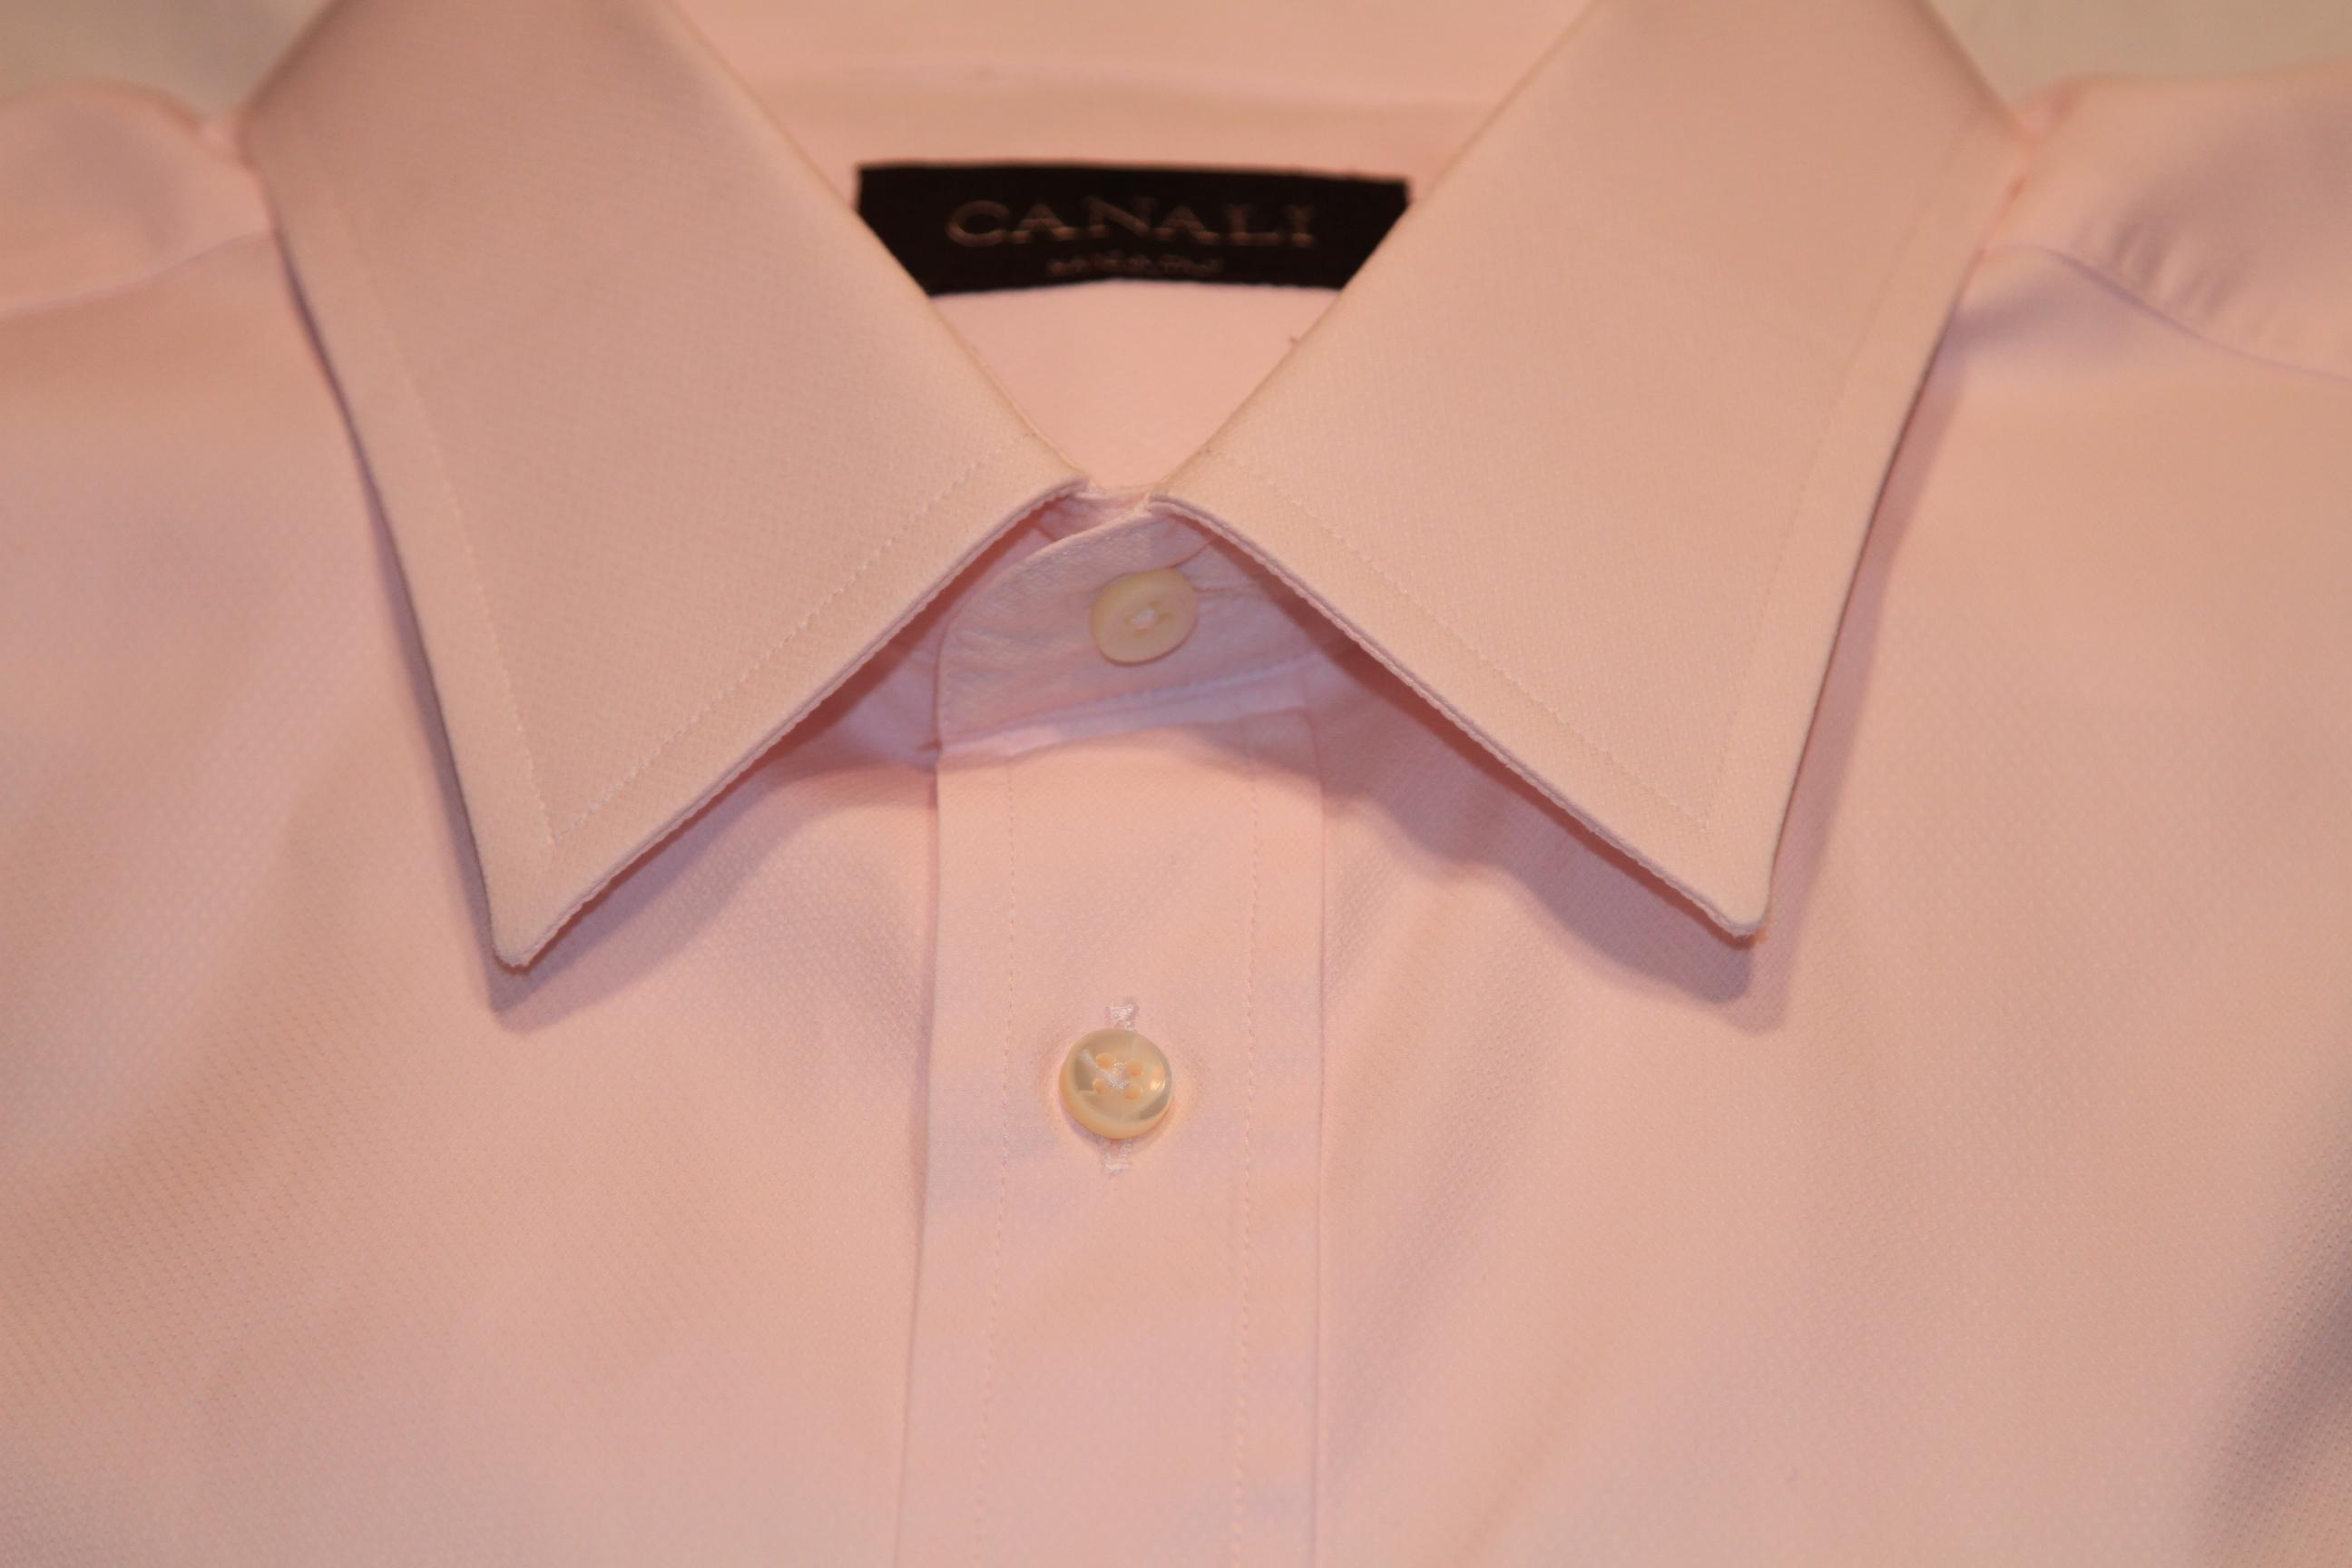 #13 - Canali 41/16 Light Pink Solid (subtle diamond pattern)